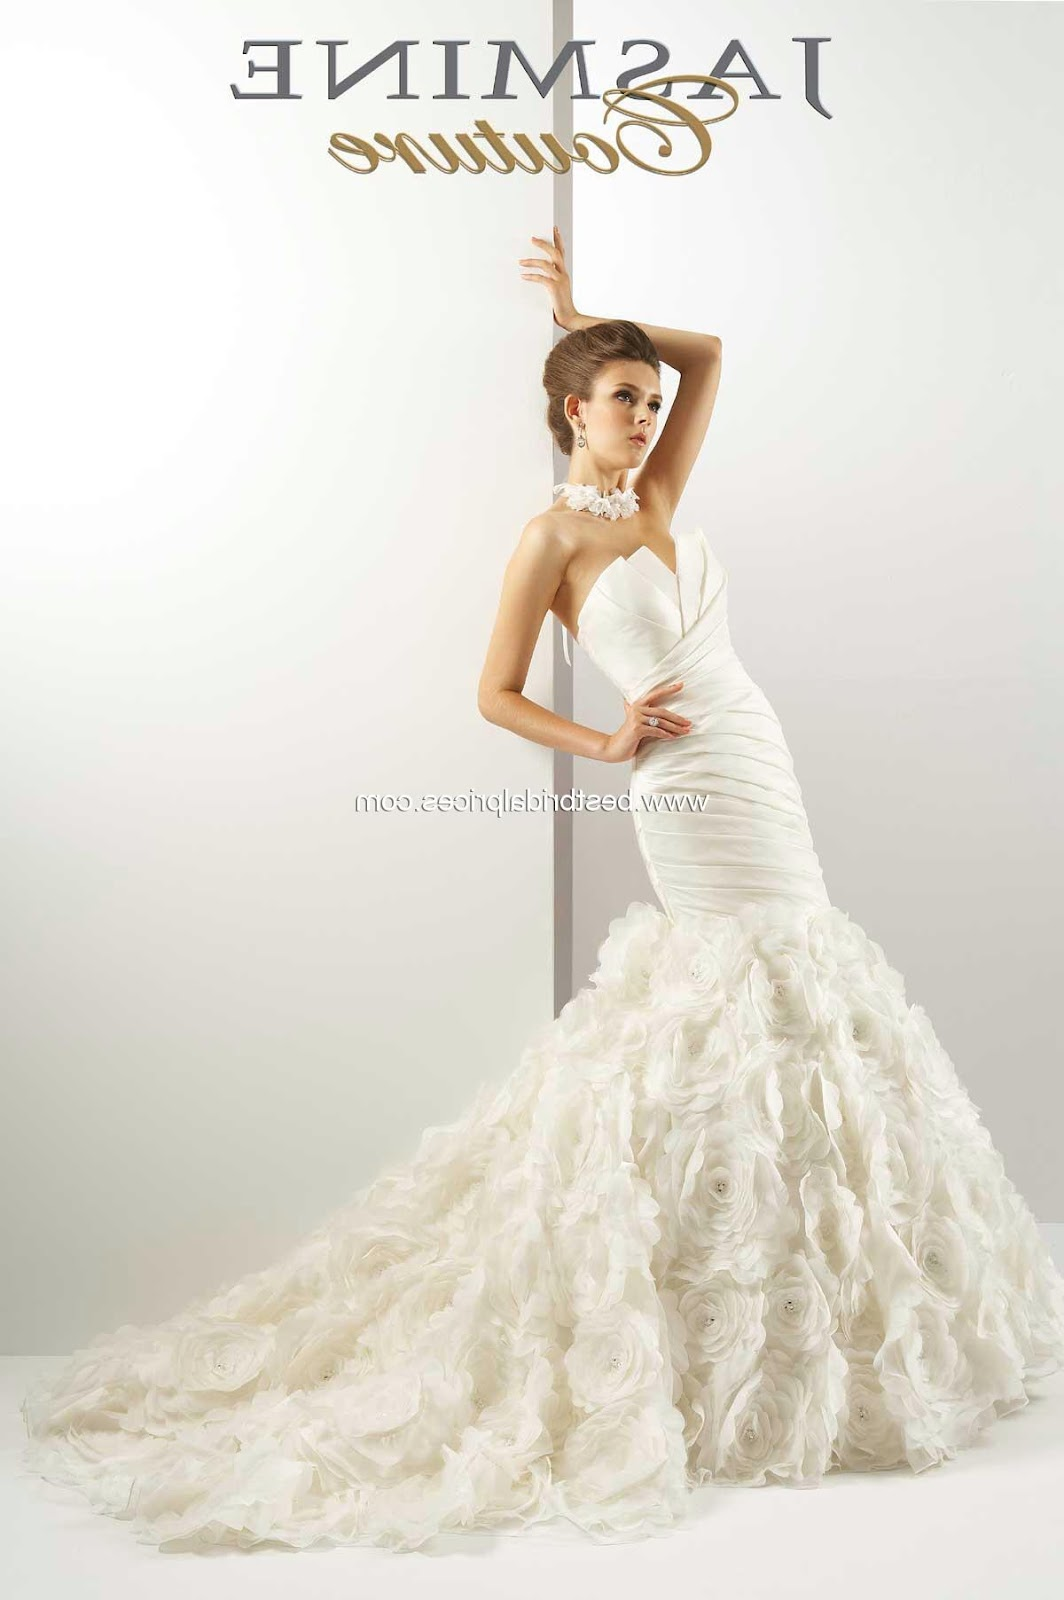 Yanisell 39 s blog jasmine wedding dress disney for Jasmine wedding dress disney